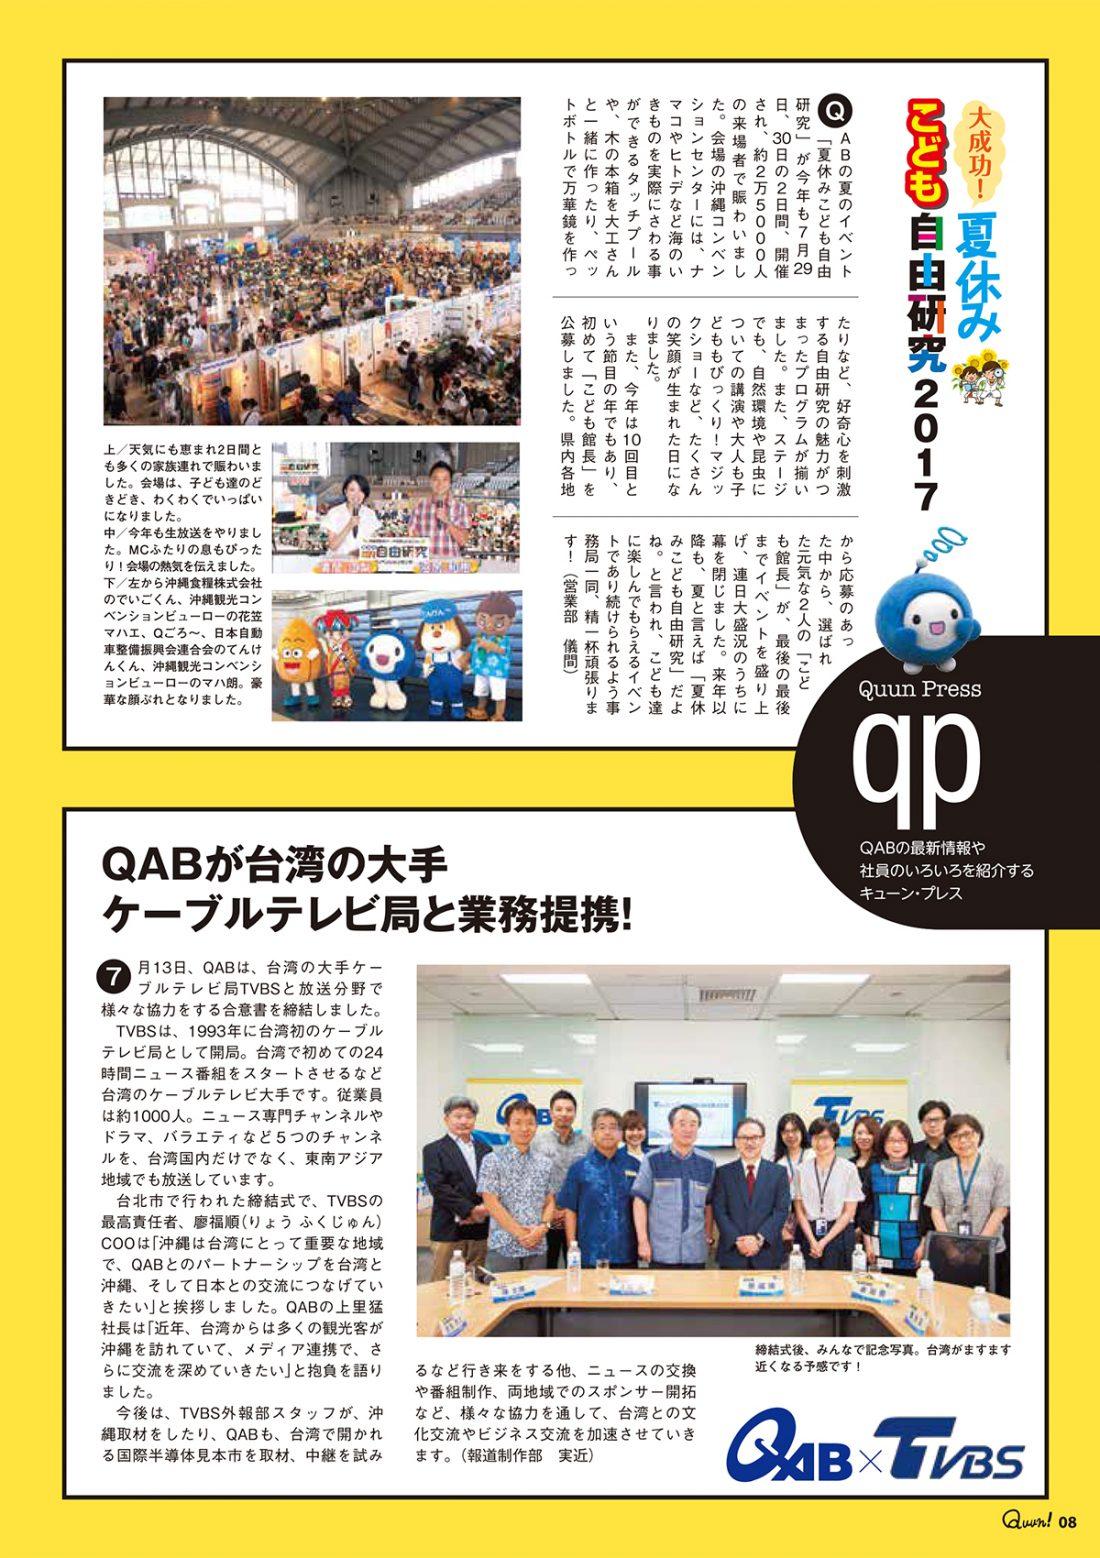 https://www.qab.co.jp/qgoro/wp-content/uploads/quun_0810-1100x1558.jpg